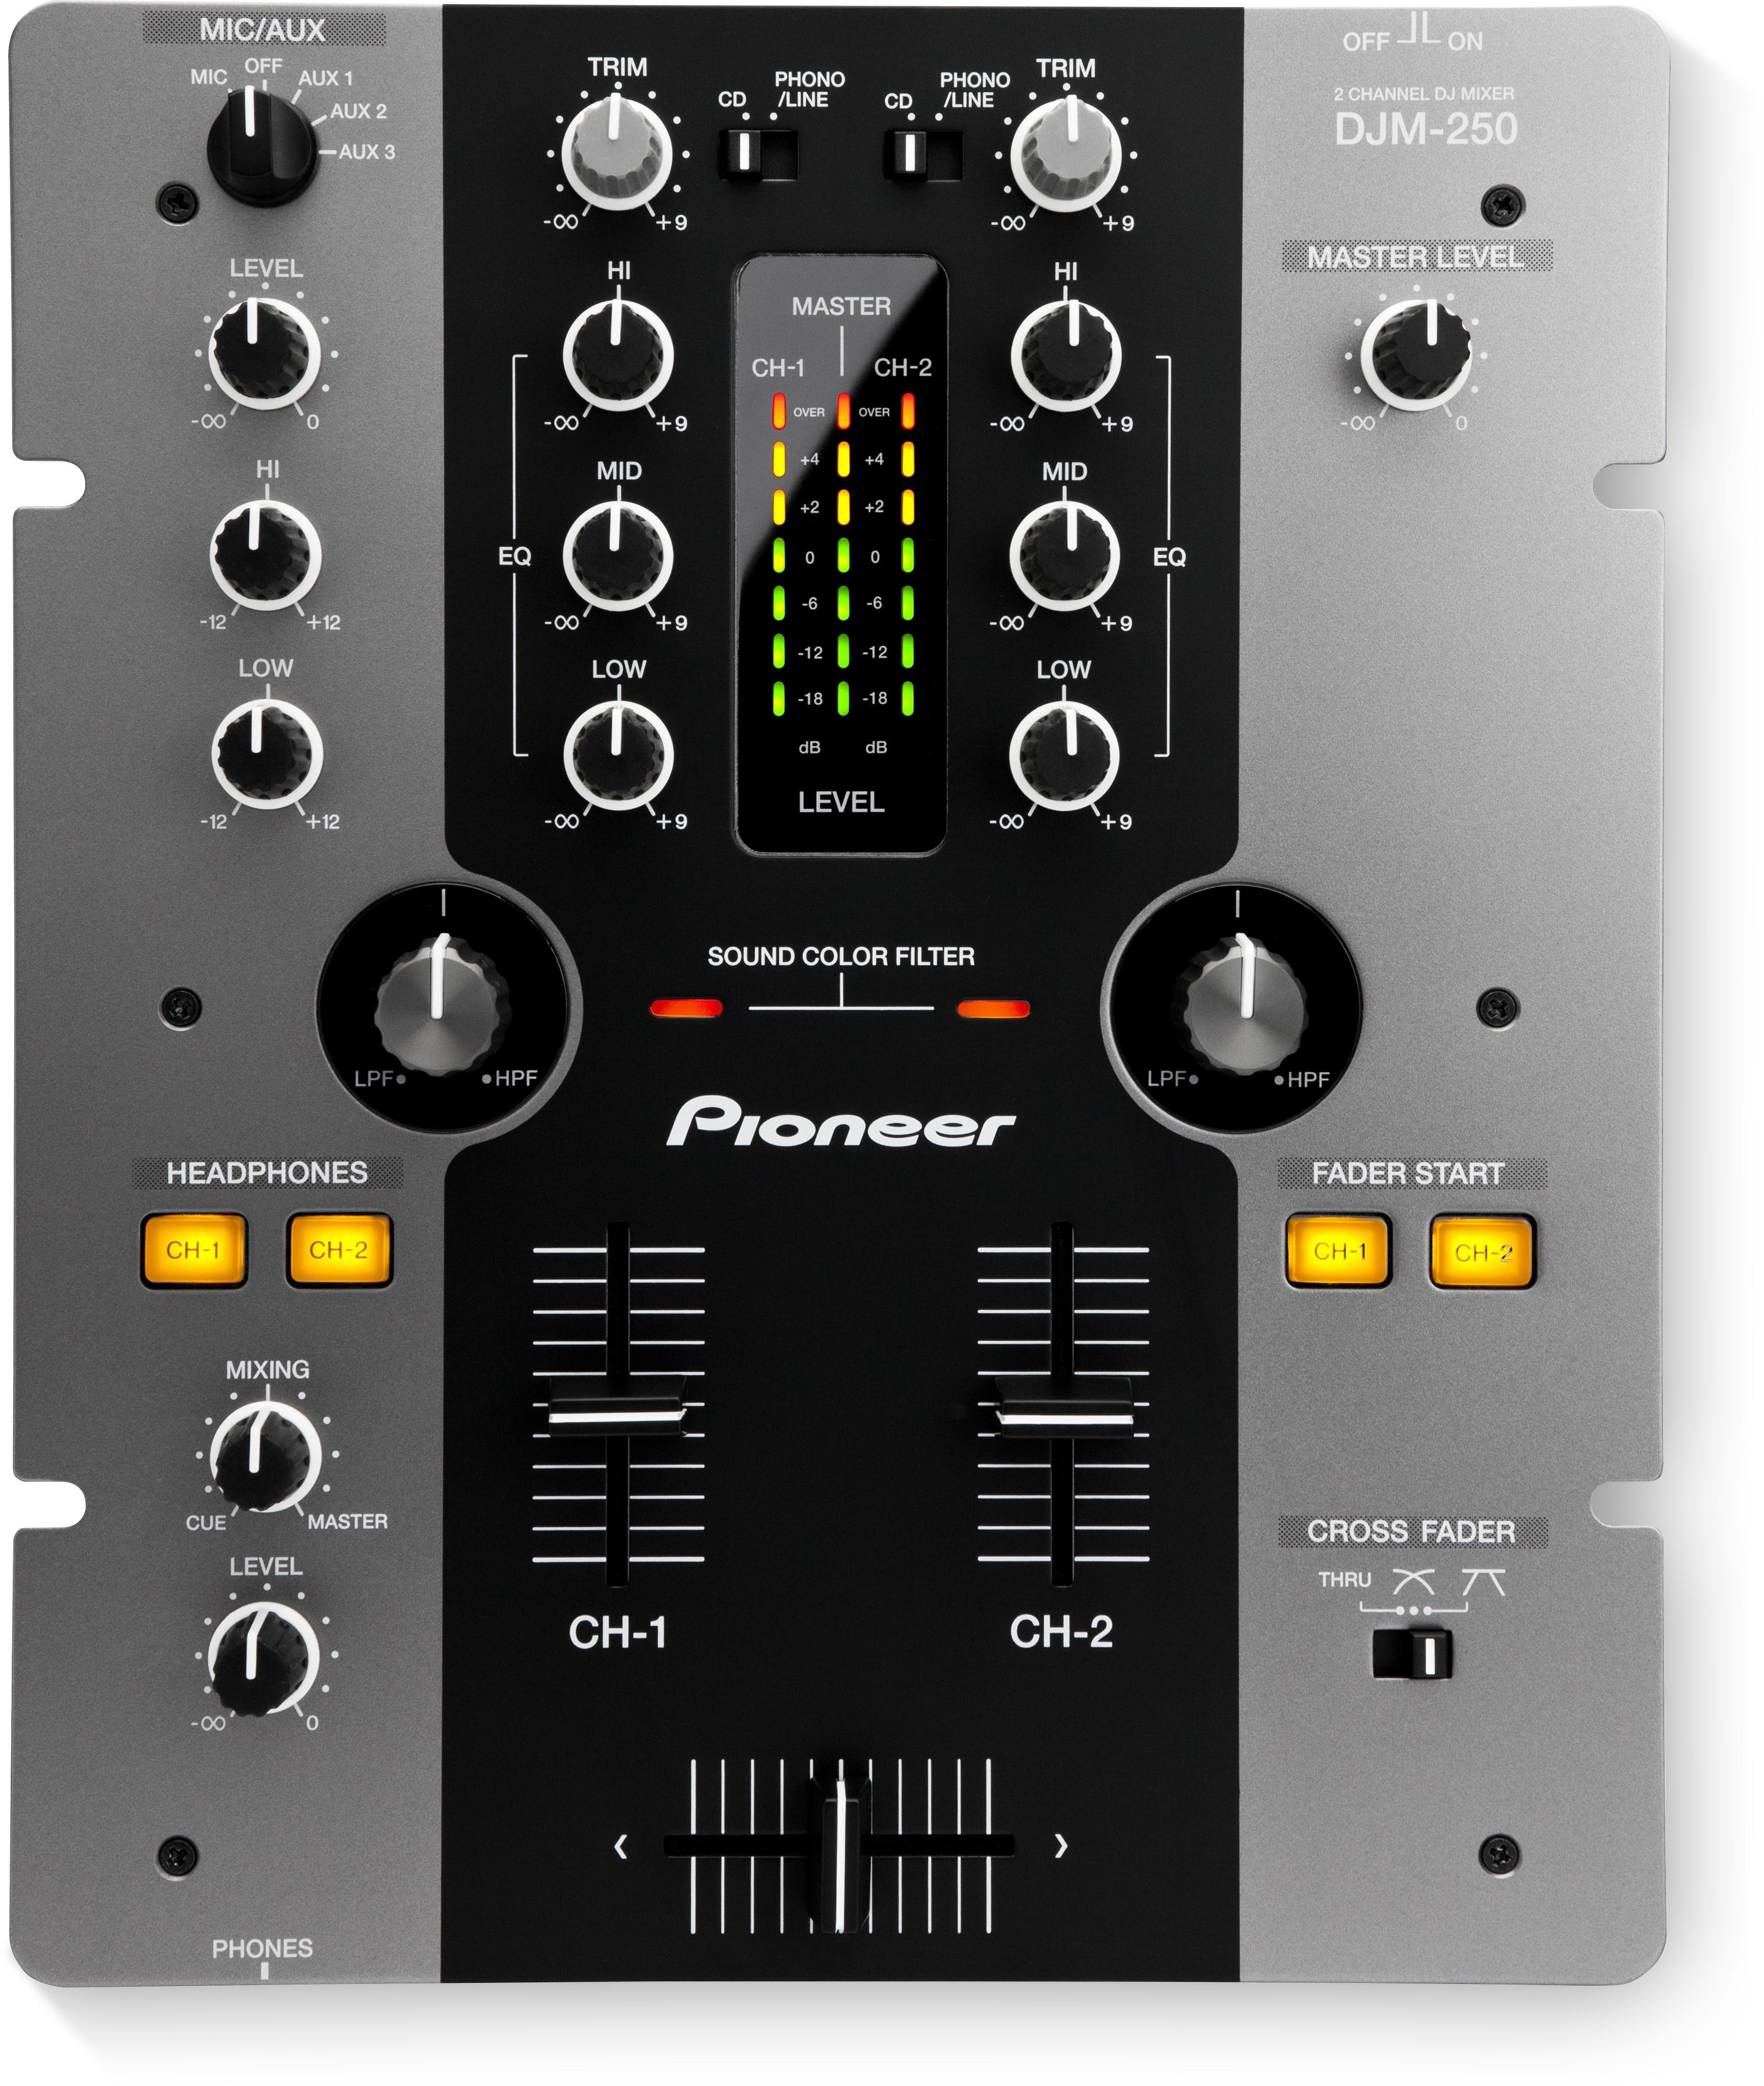 DJM-250-K (archived) 2-channel mixer (black) - Pioneer DJ